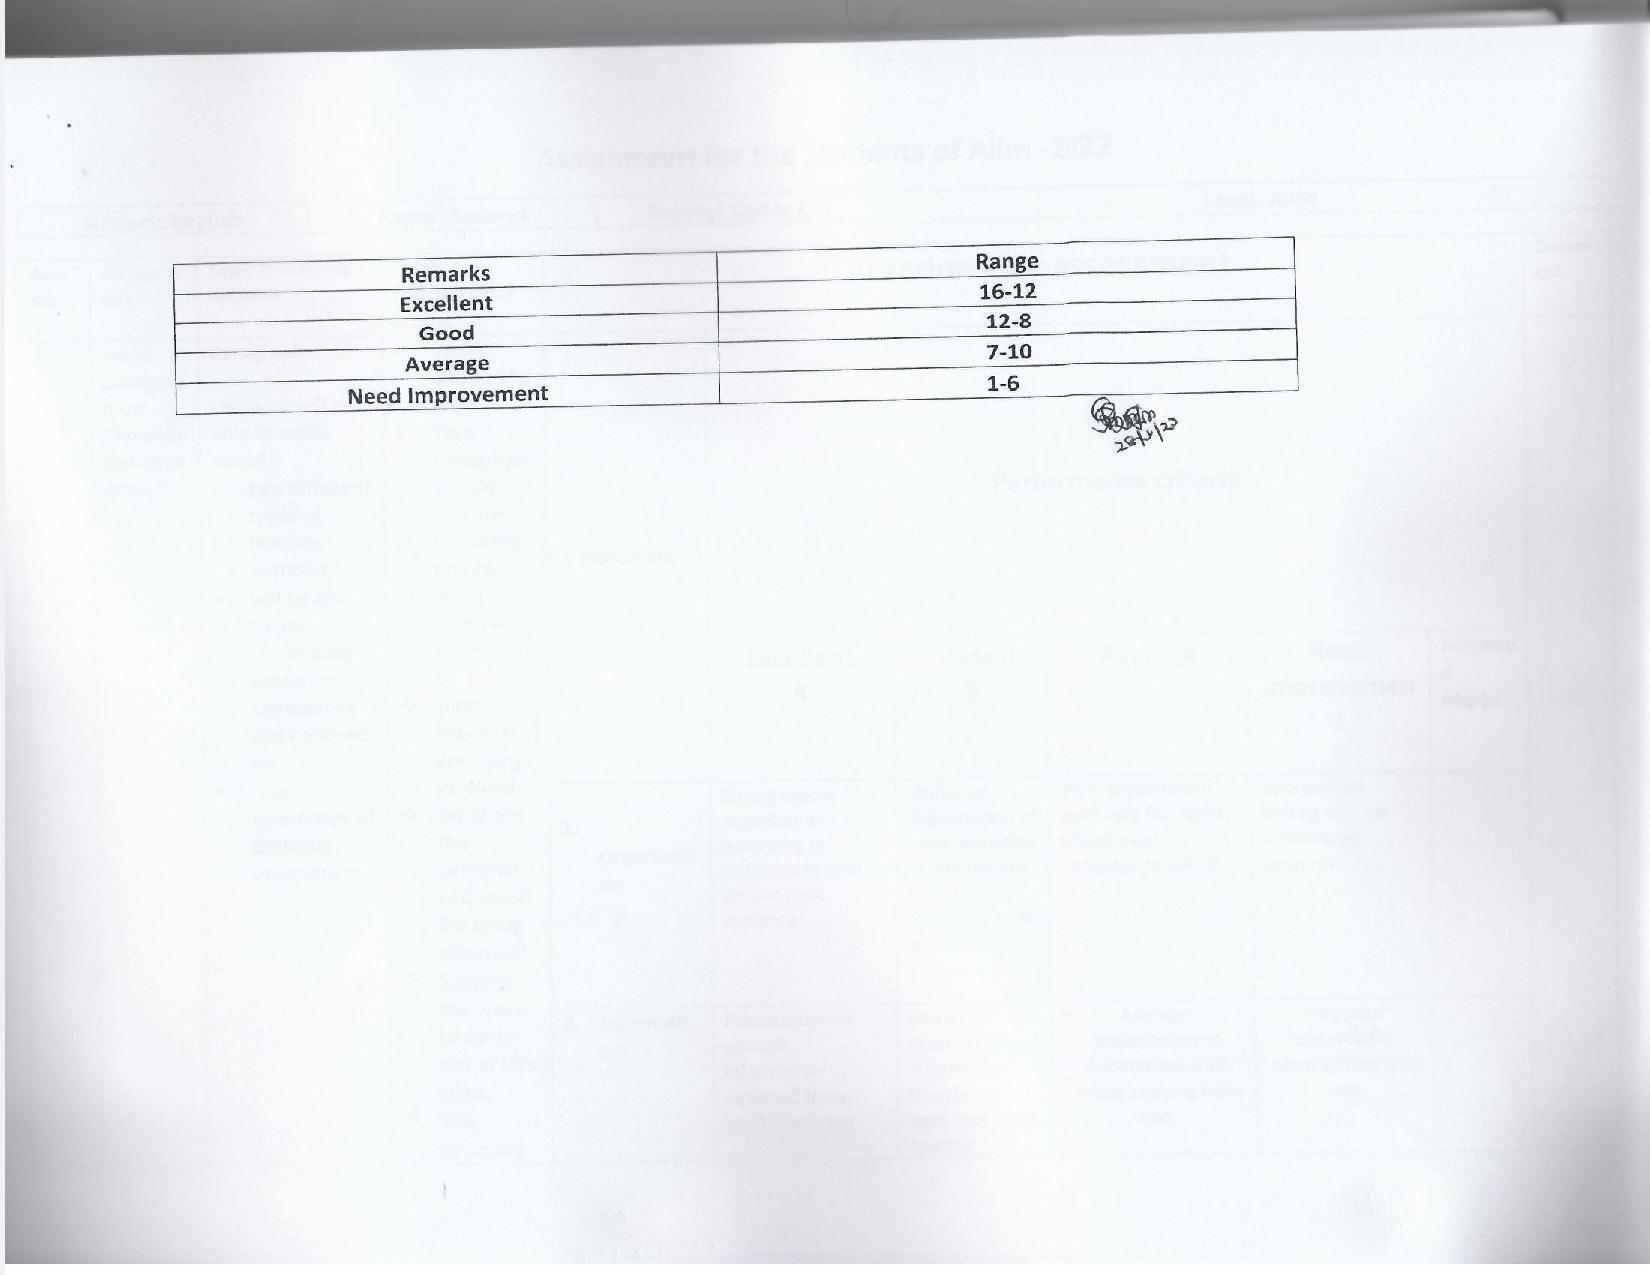 Alim Examination 2022 3rd Week Assignment Published, আলিম ১২শ শ্রেণির ৩য় সপ্তাহের অ্যাসাইনমেন্ট প্রকাশ ২০২১ https://www.banglanewsexpress.com/